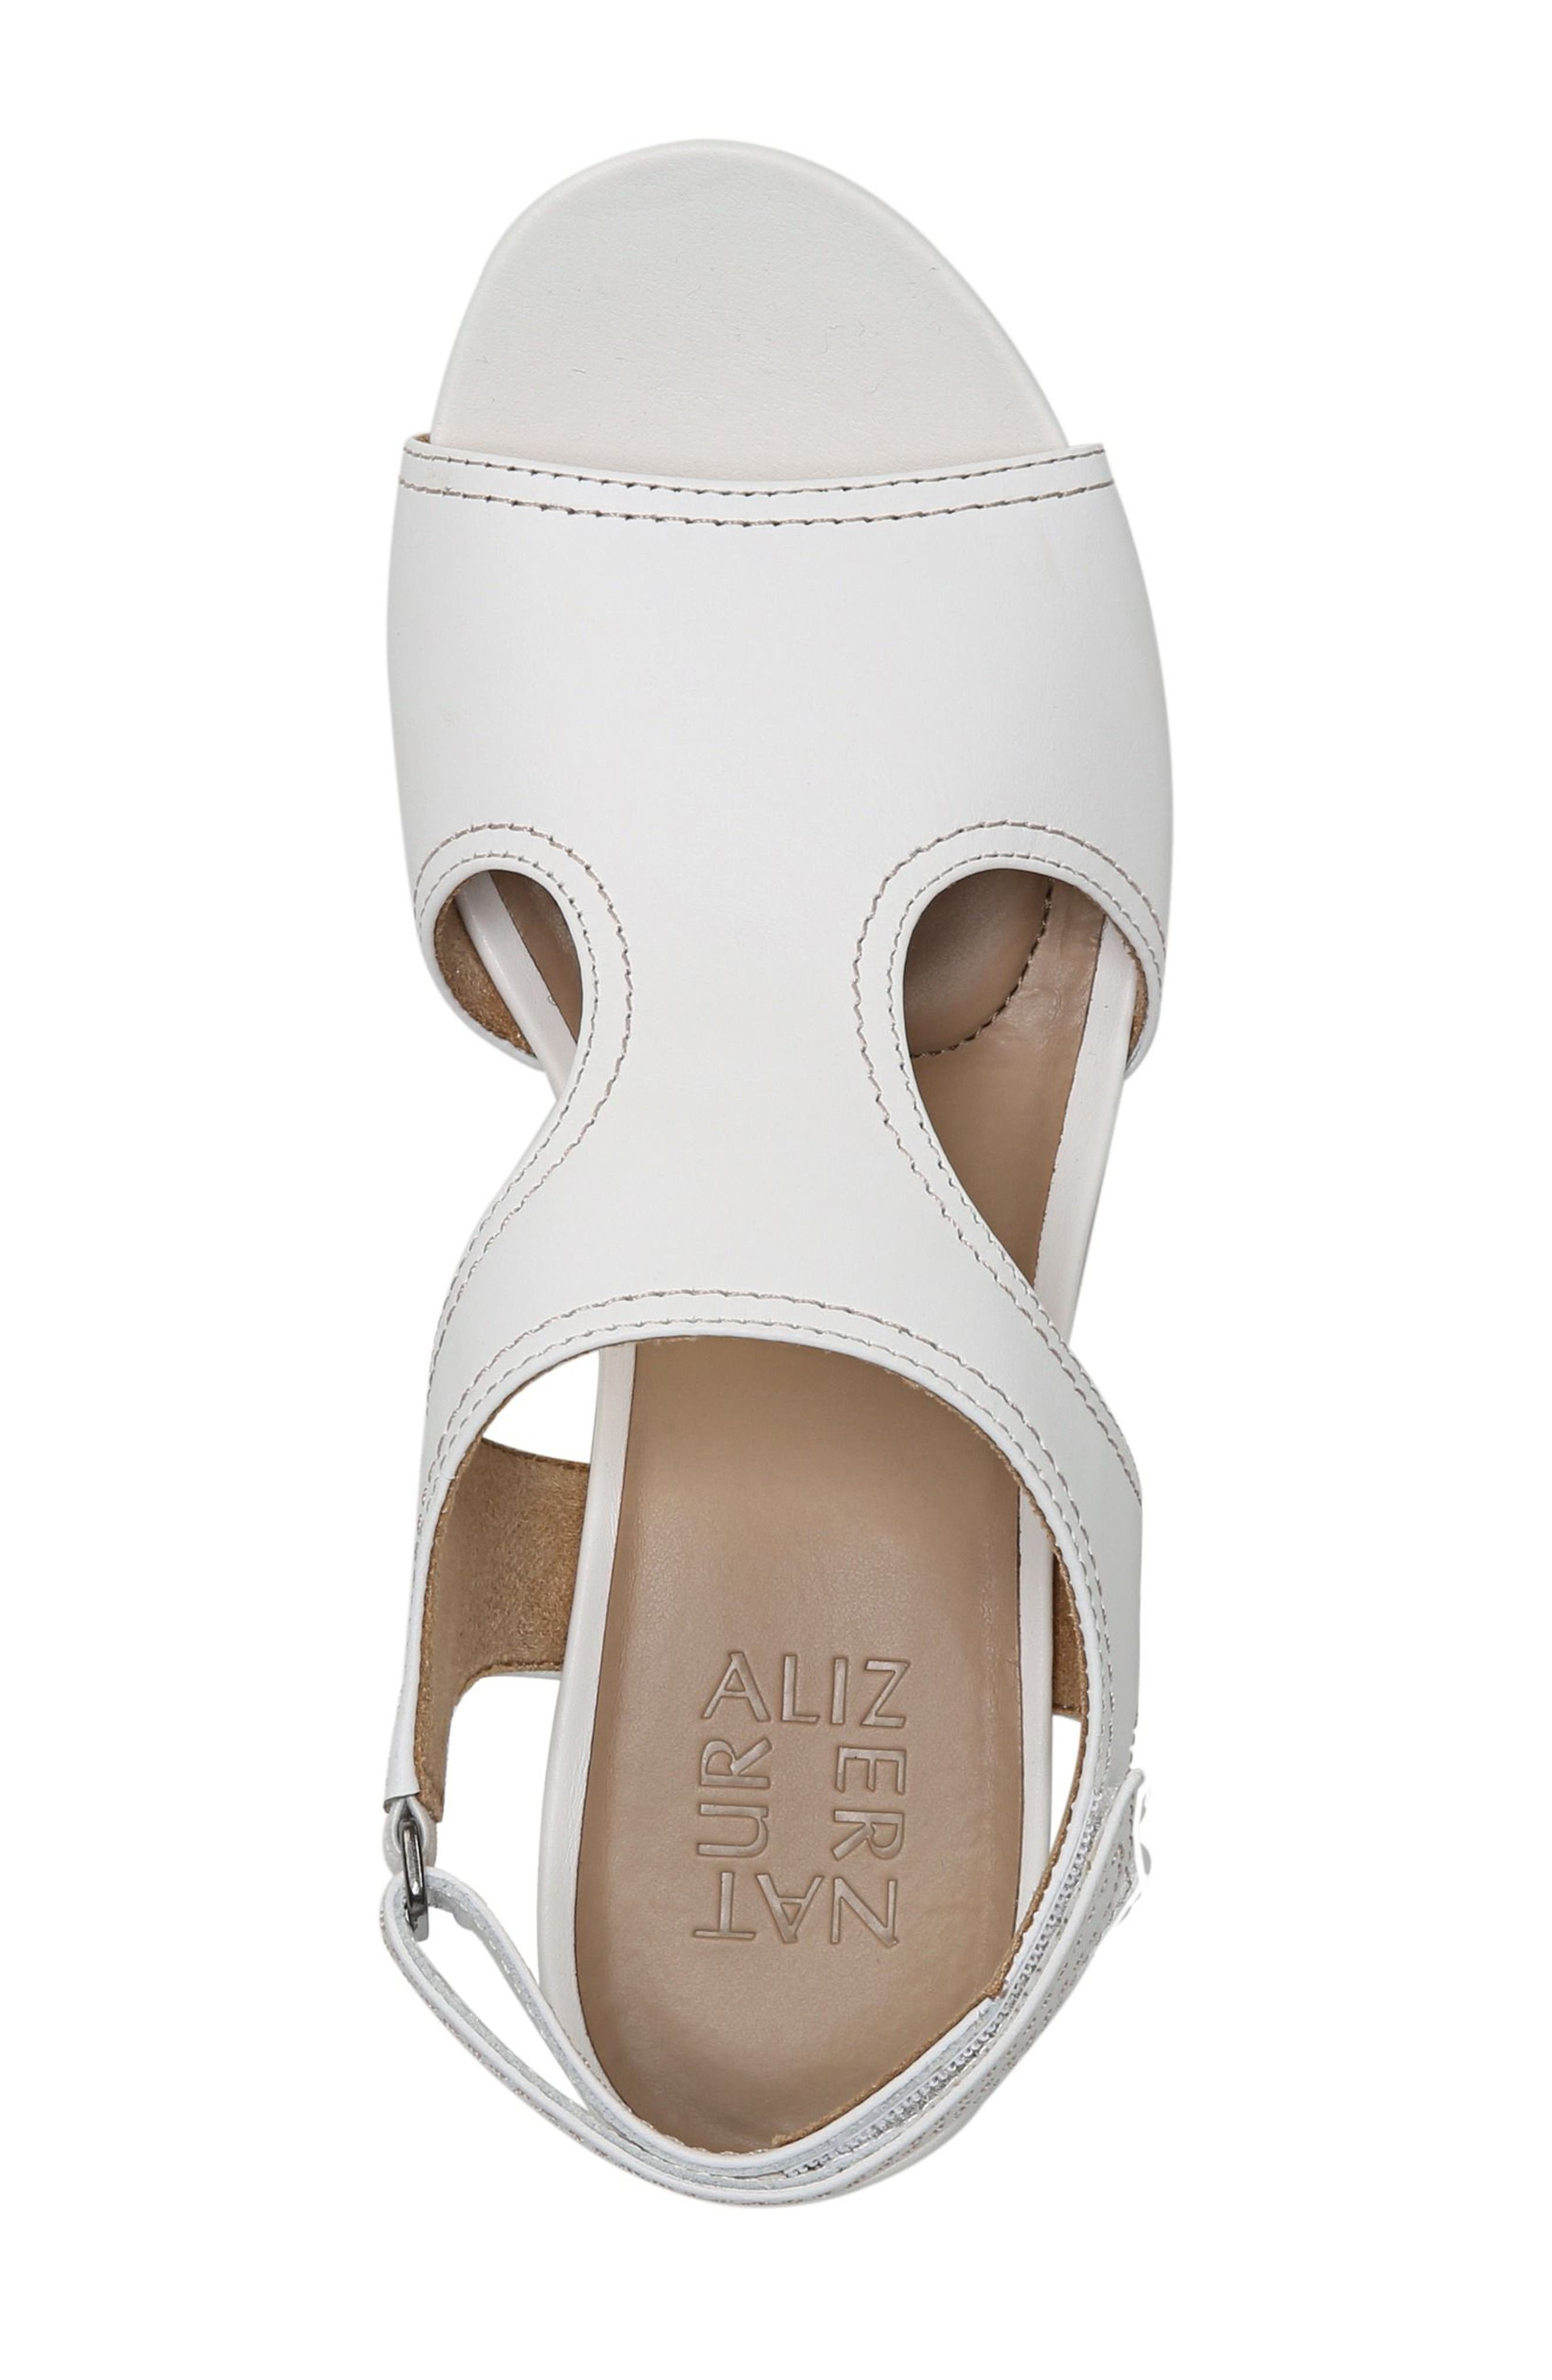 Cinda Wedge Sandal,                             Alternate thumbnail 5, color,                             White Leather